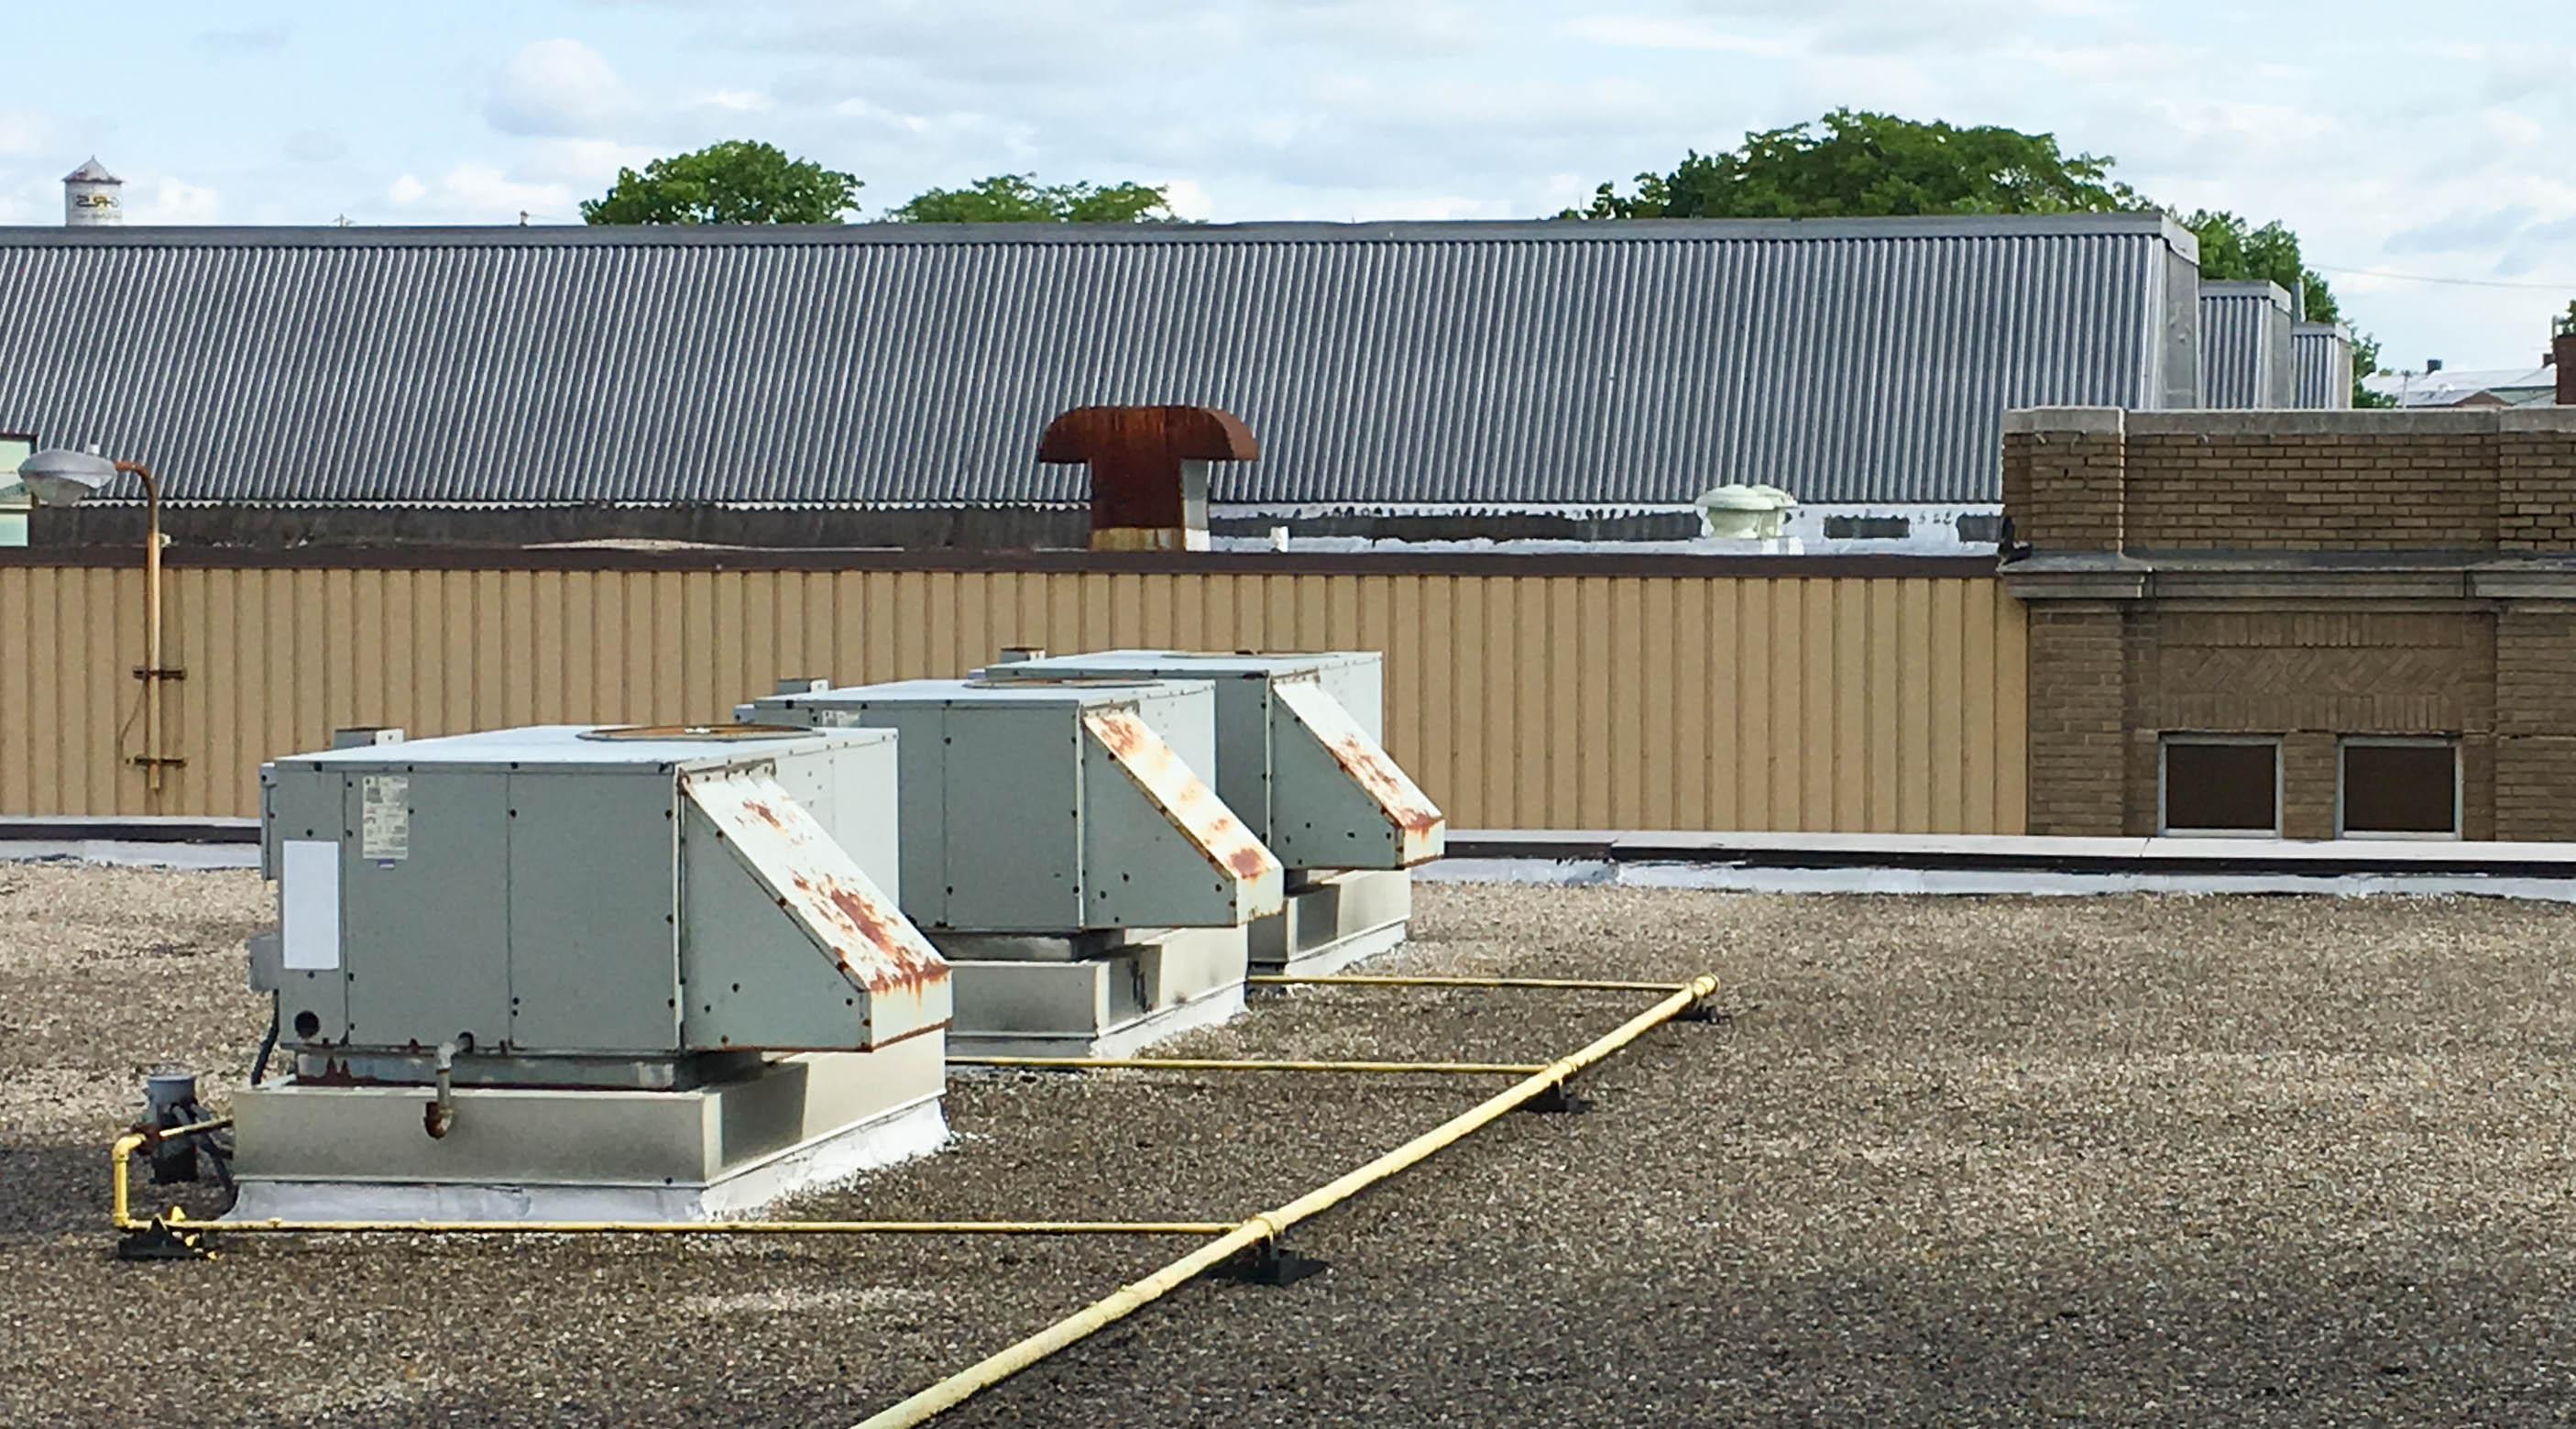 HVAC units on rooftop